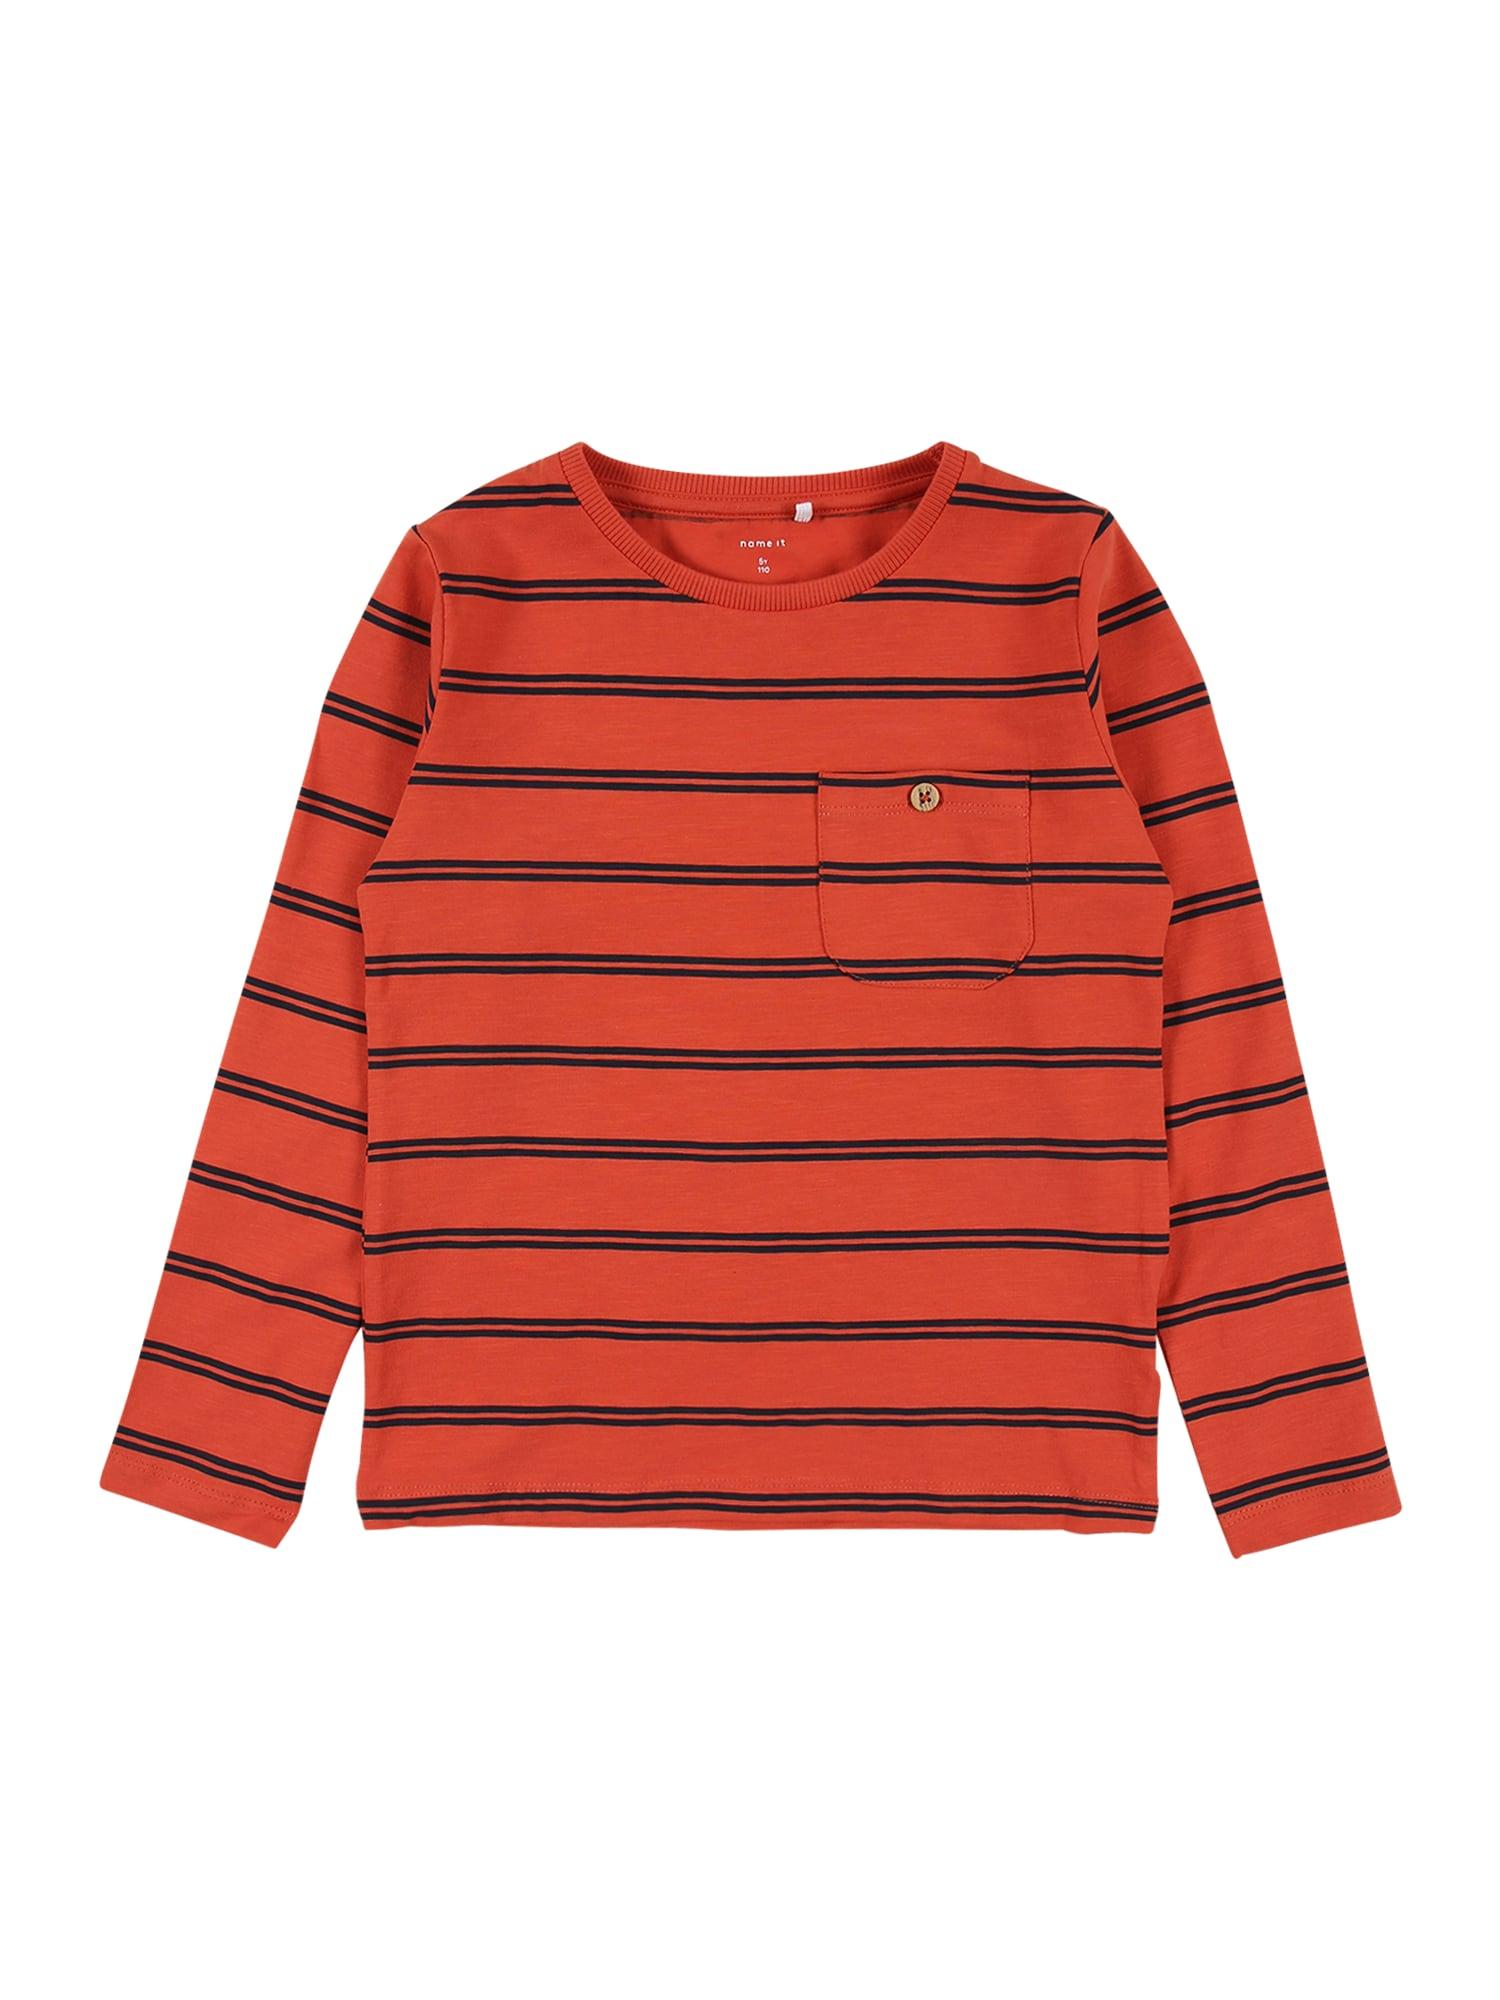 NAME IT Tričko 'SIMO'  oranžová / námořnická modř